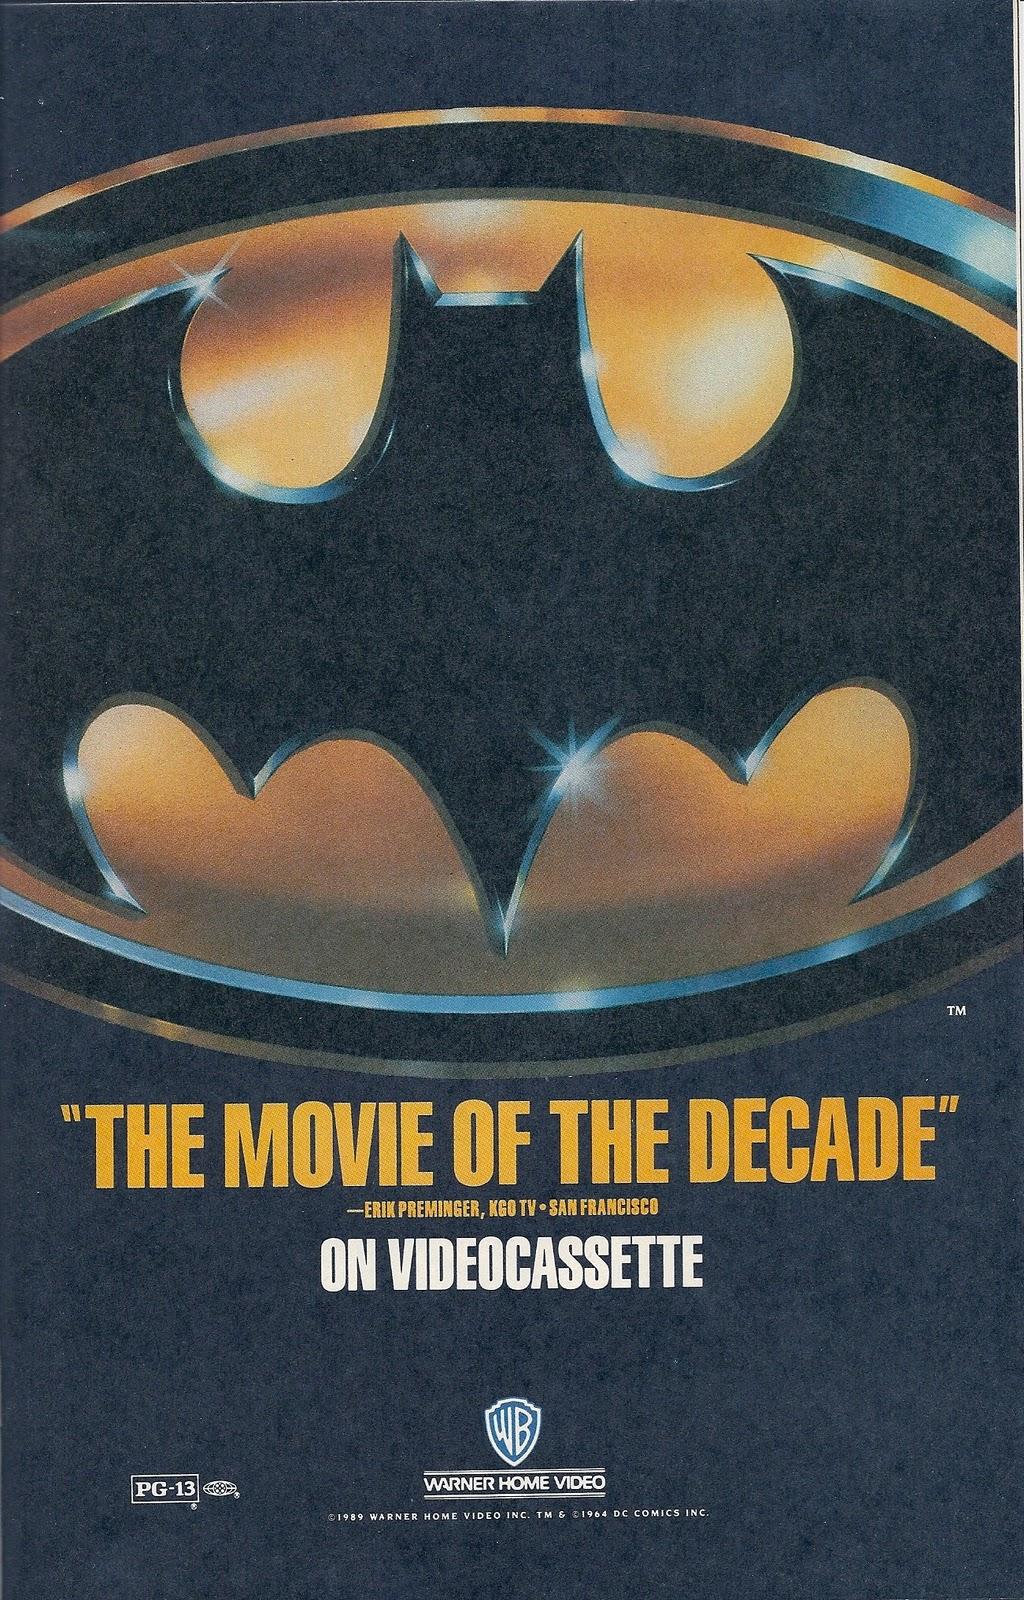 http://3.bp.blogspot.com/_-xKhHa-YrMc/TOoFSSd-OFI/AAAAAAAADpY/sSZHdQ-axiE/s1600/Batman+VHS+ad.jpg